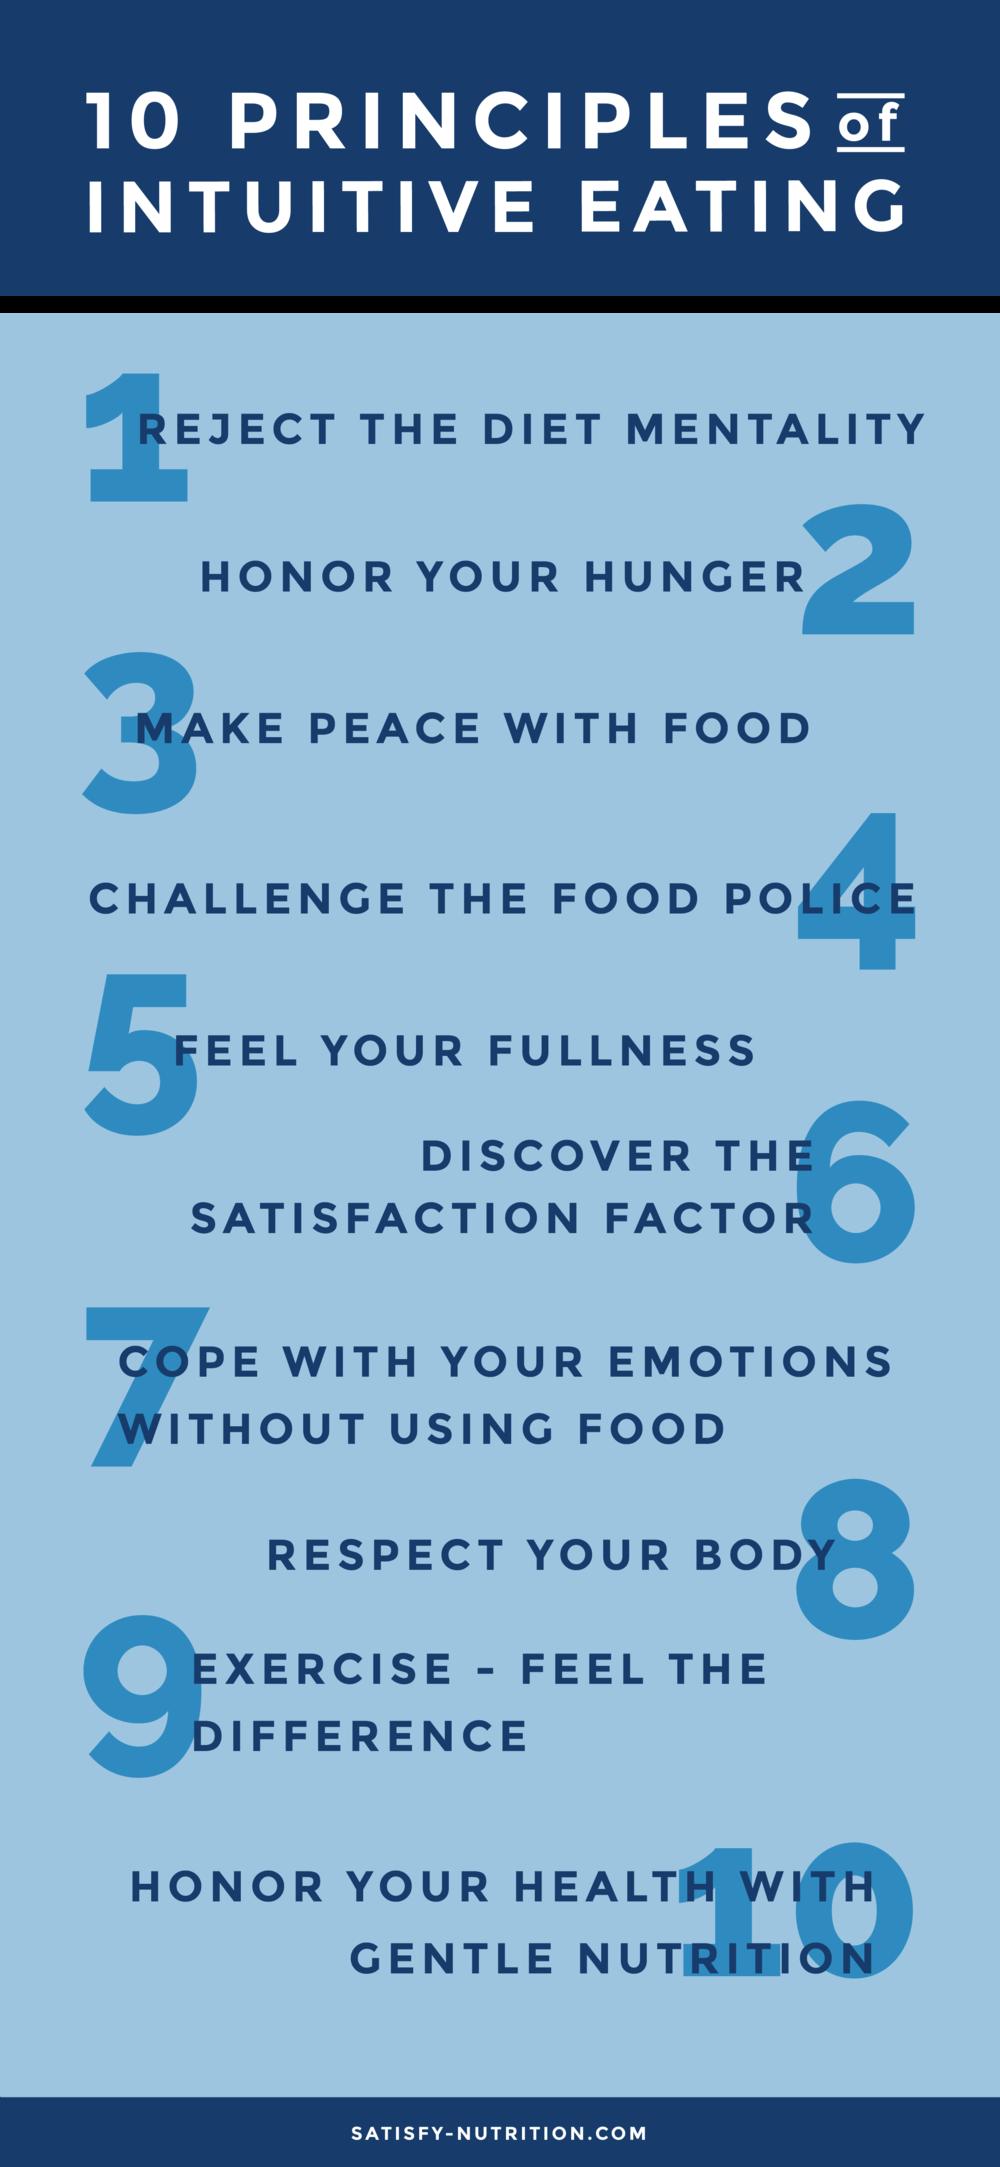 IE Principles.png